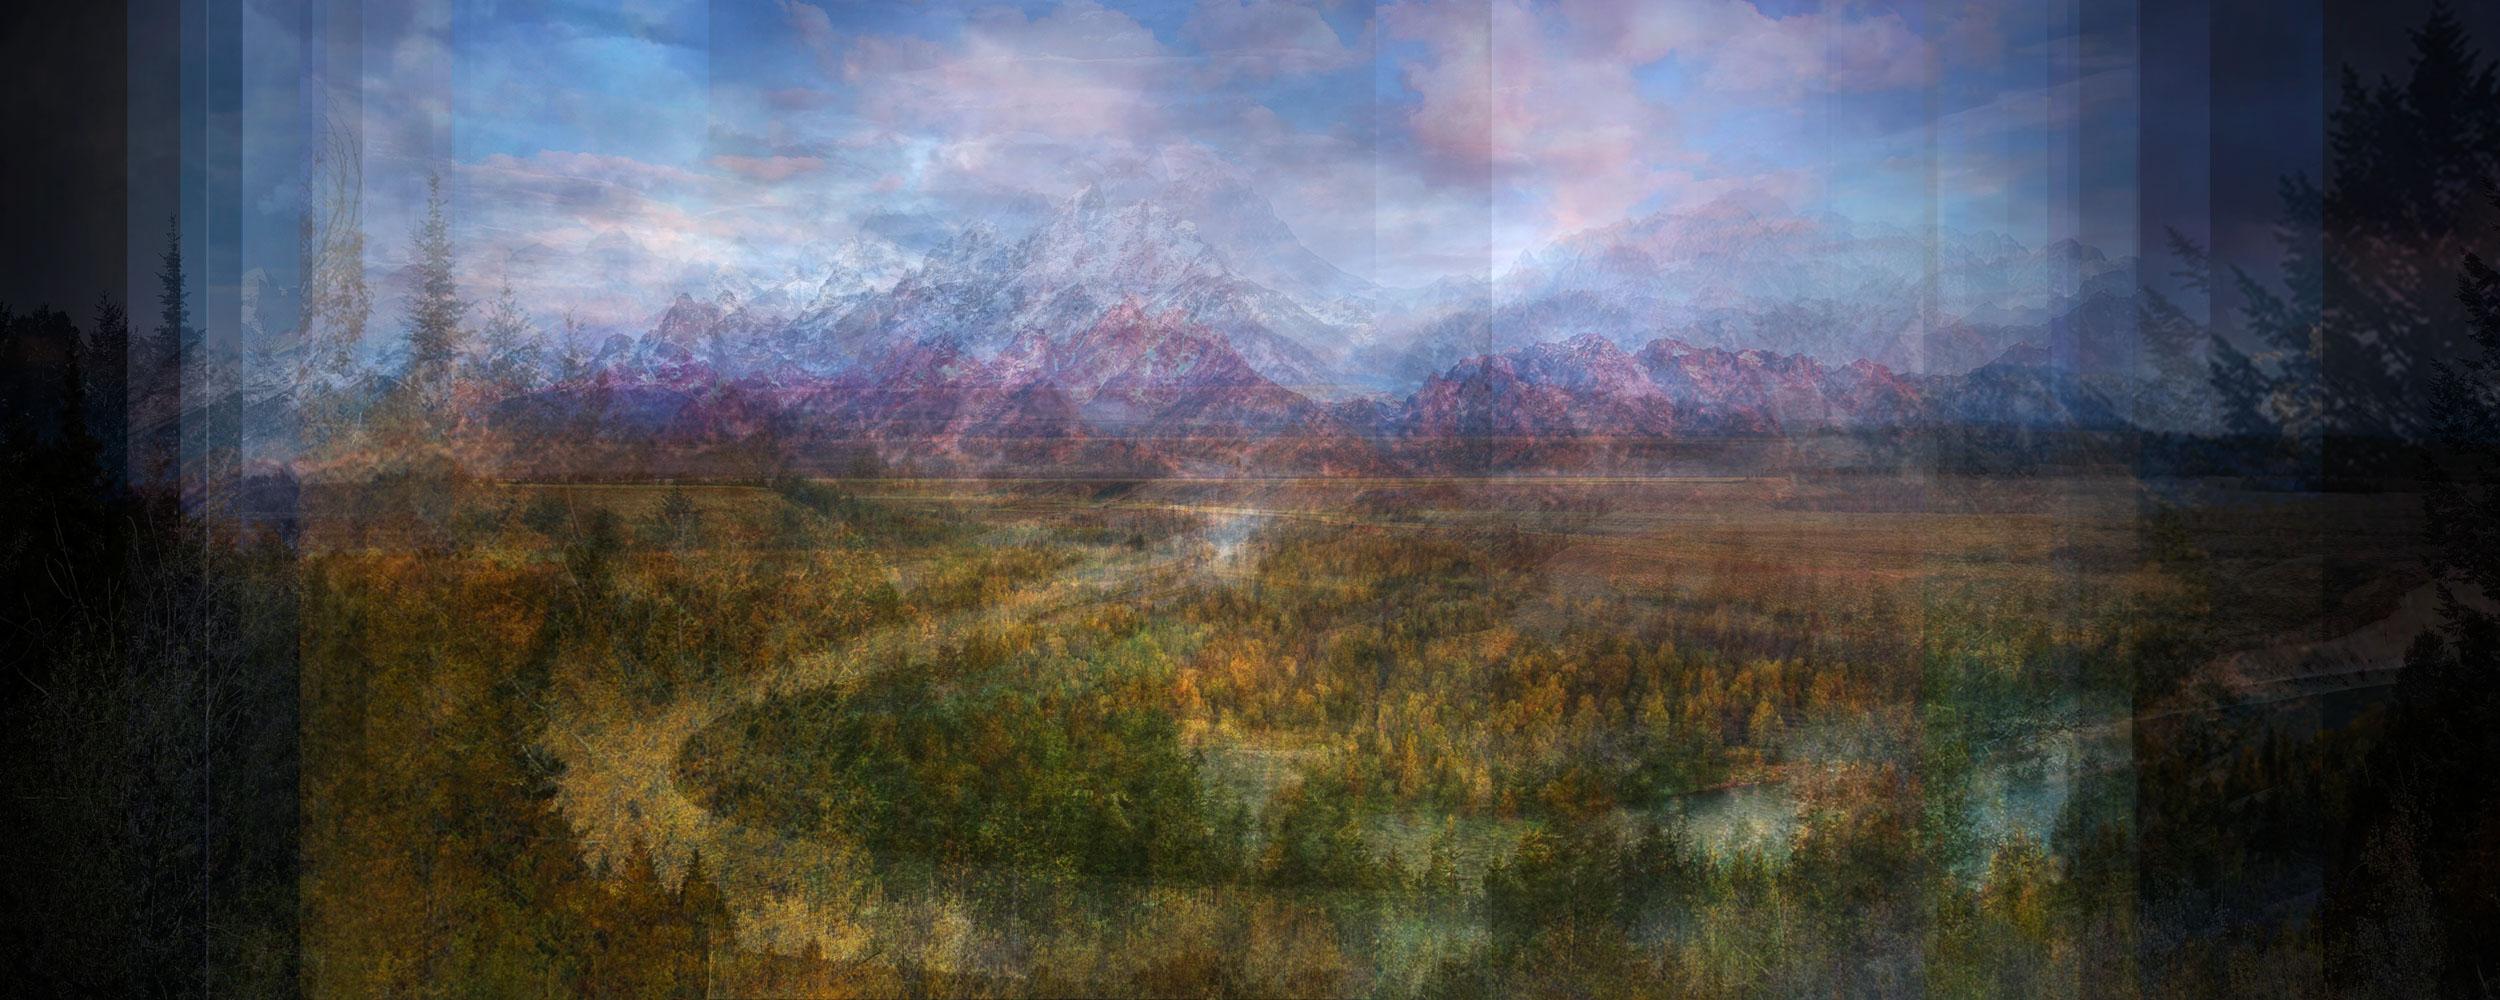 Snake River Overlook (2013)